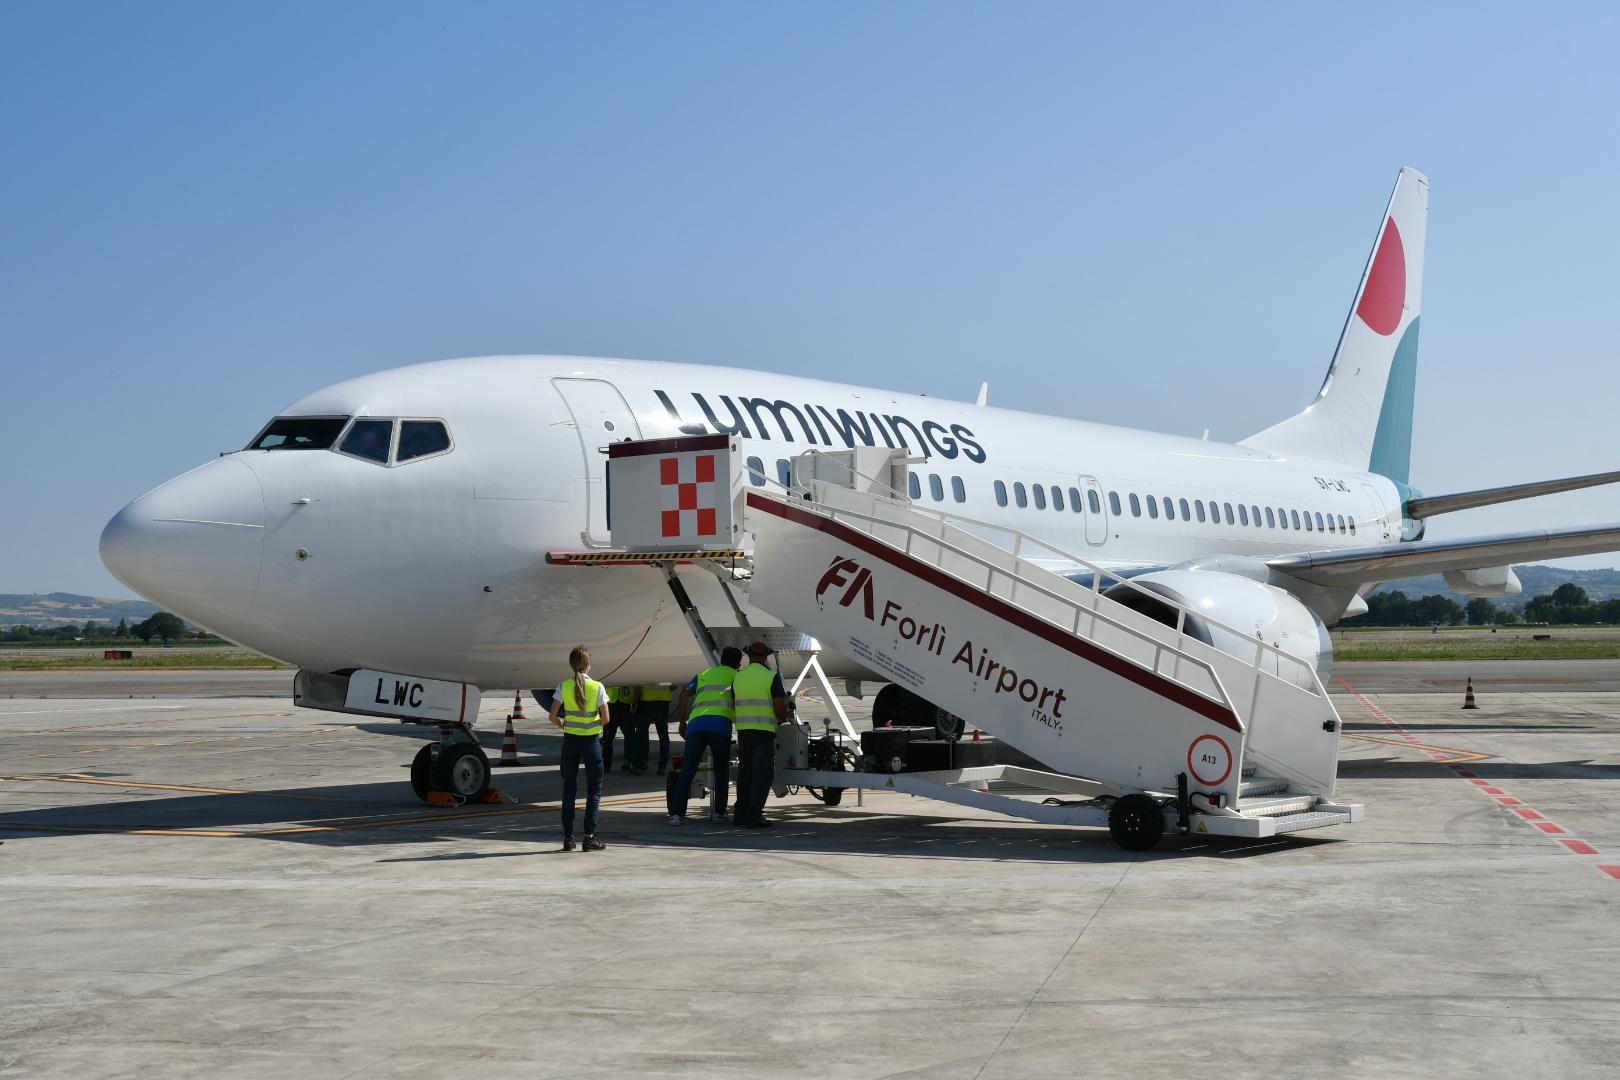 Itaca Lumiwings aeroporto boeing